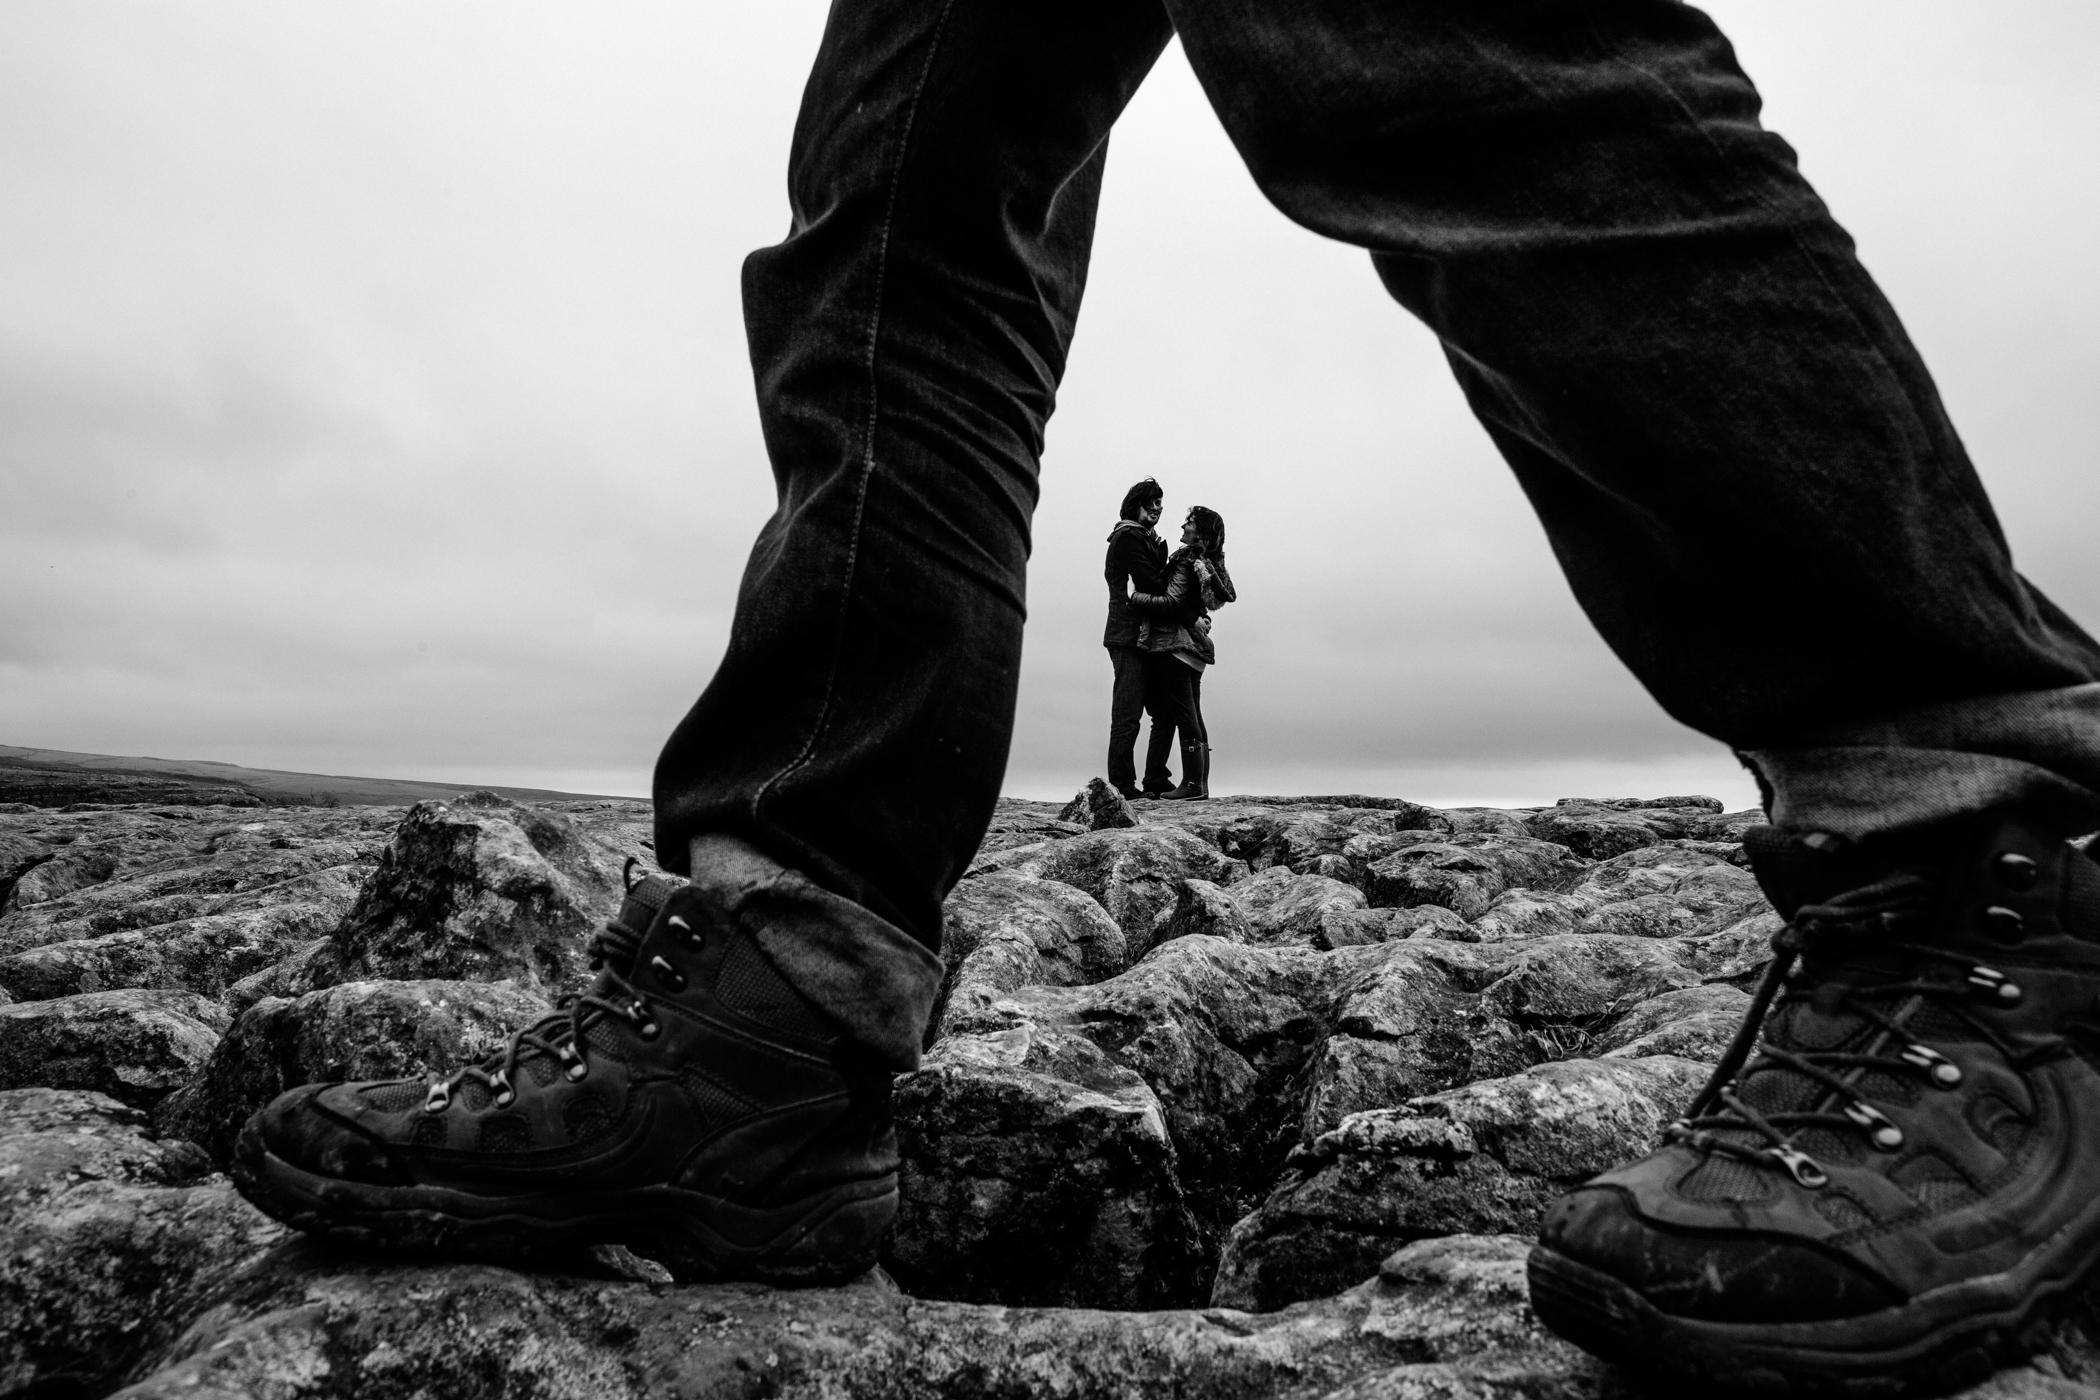 sansom wedding photography malham cove-20